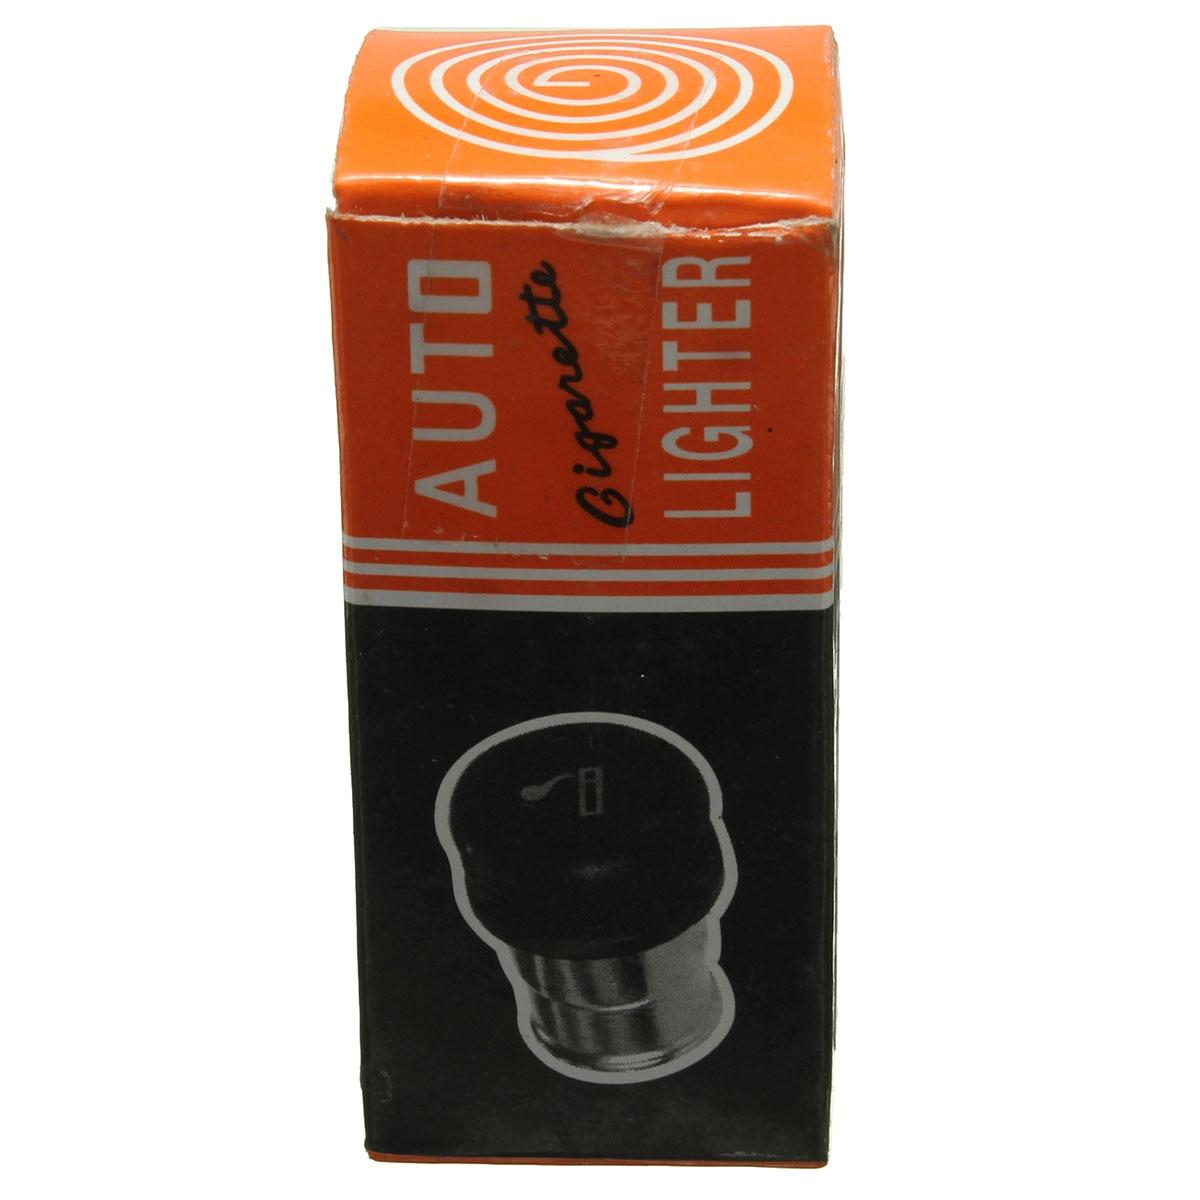 New Black Universal 12V Car Auto Cigarette Cig Lighter Element Plug for Vauxhall  Zafira Astra Corsa Vectra Vivaro-in Remote Controls from Automobiles ...